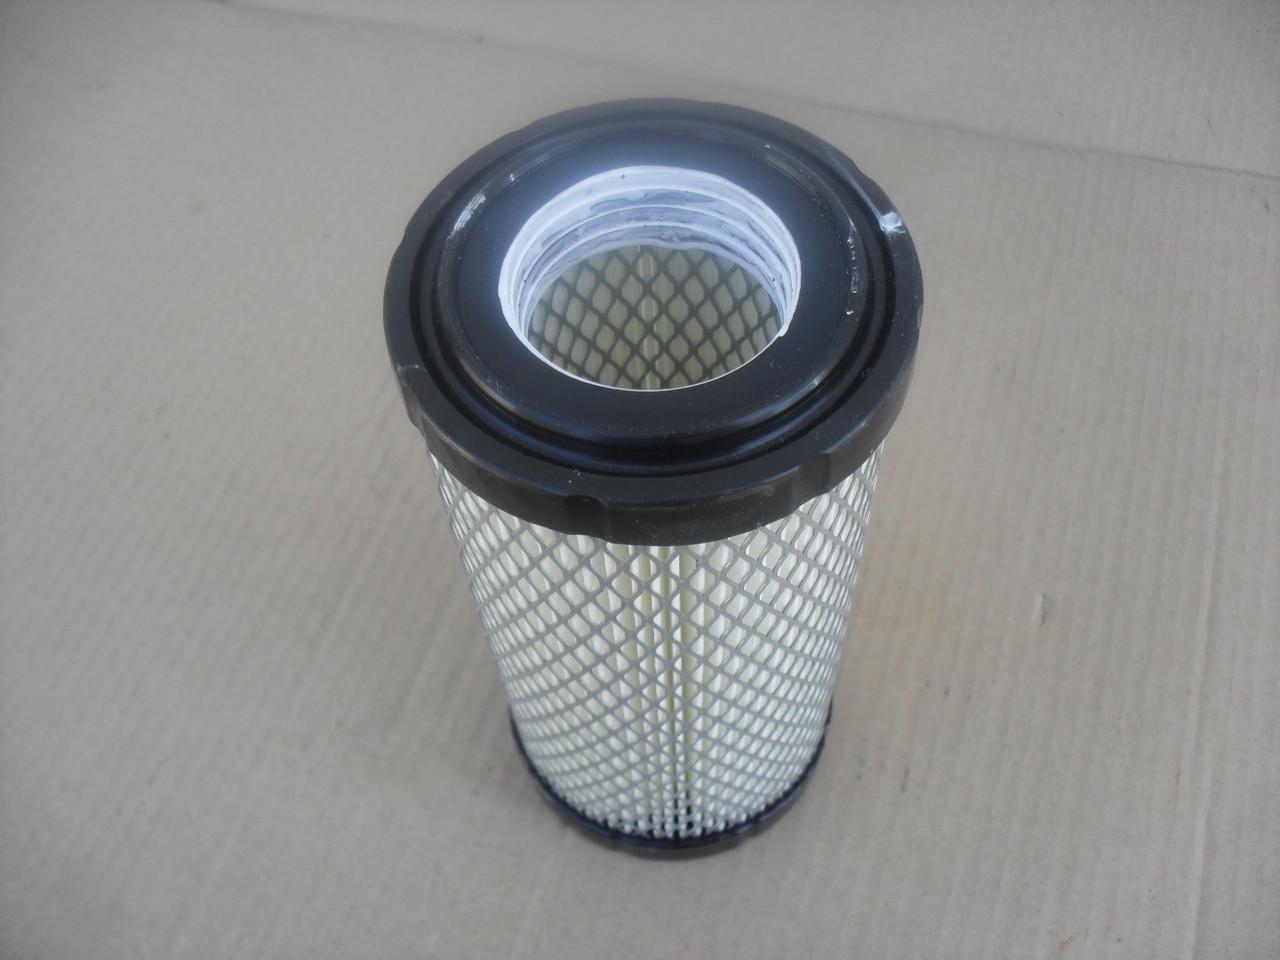 6PK Air Filter for Kubota BX Series RTV500 RTV900 KTV900 D662 D722 D782 D902